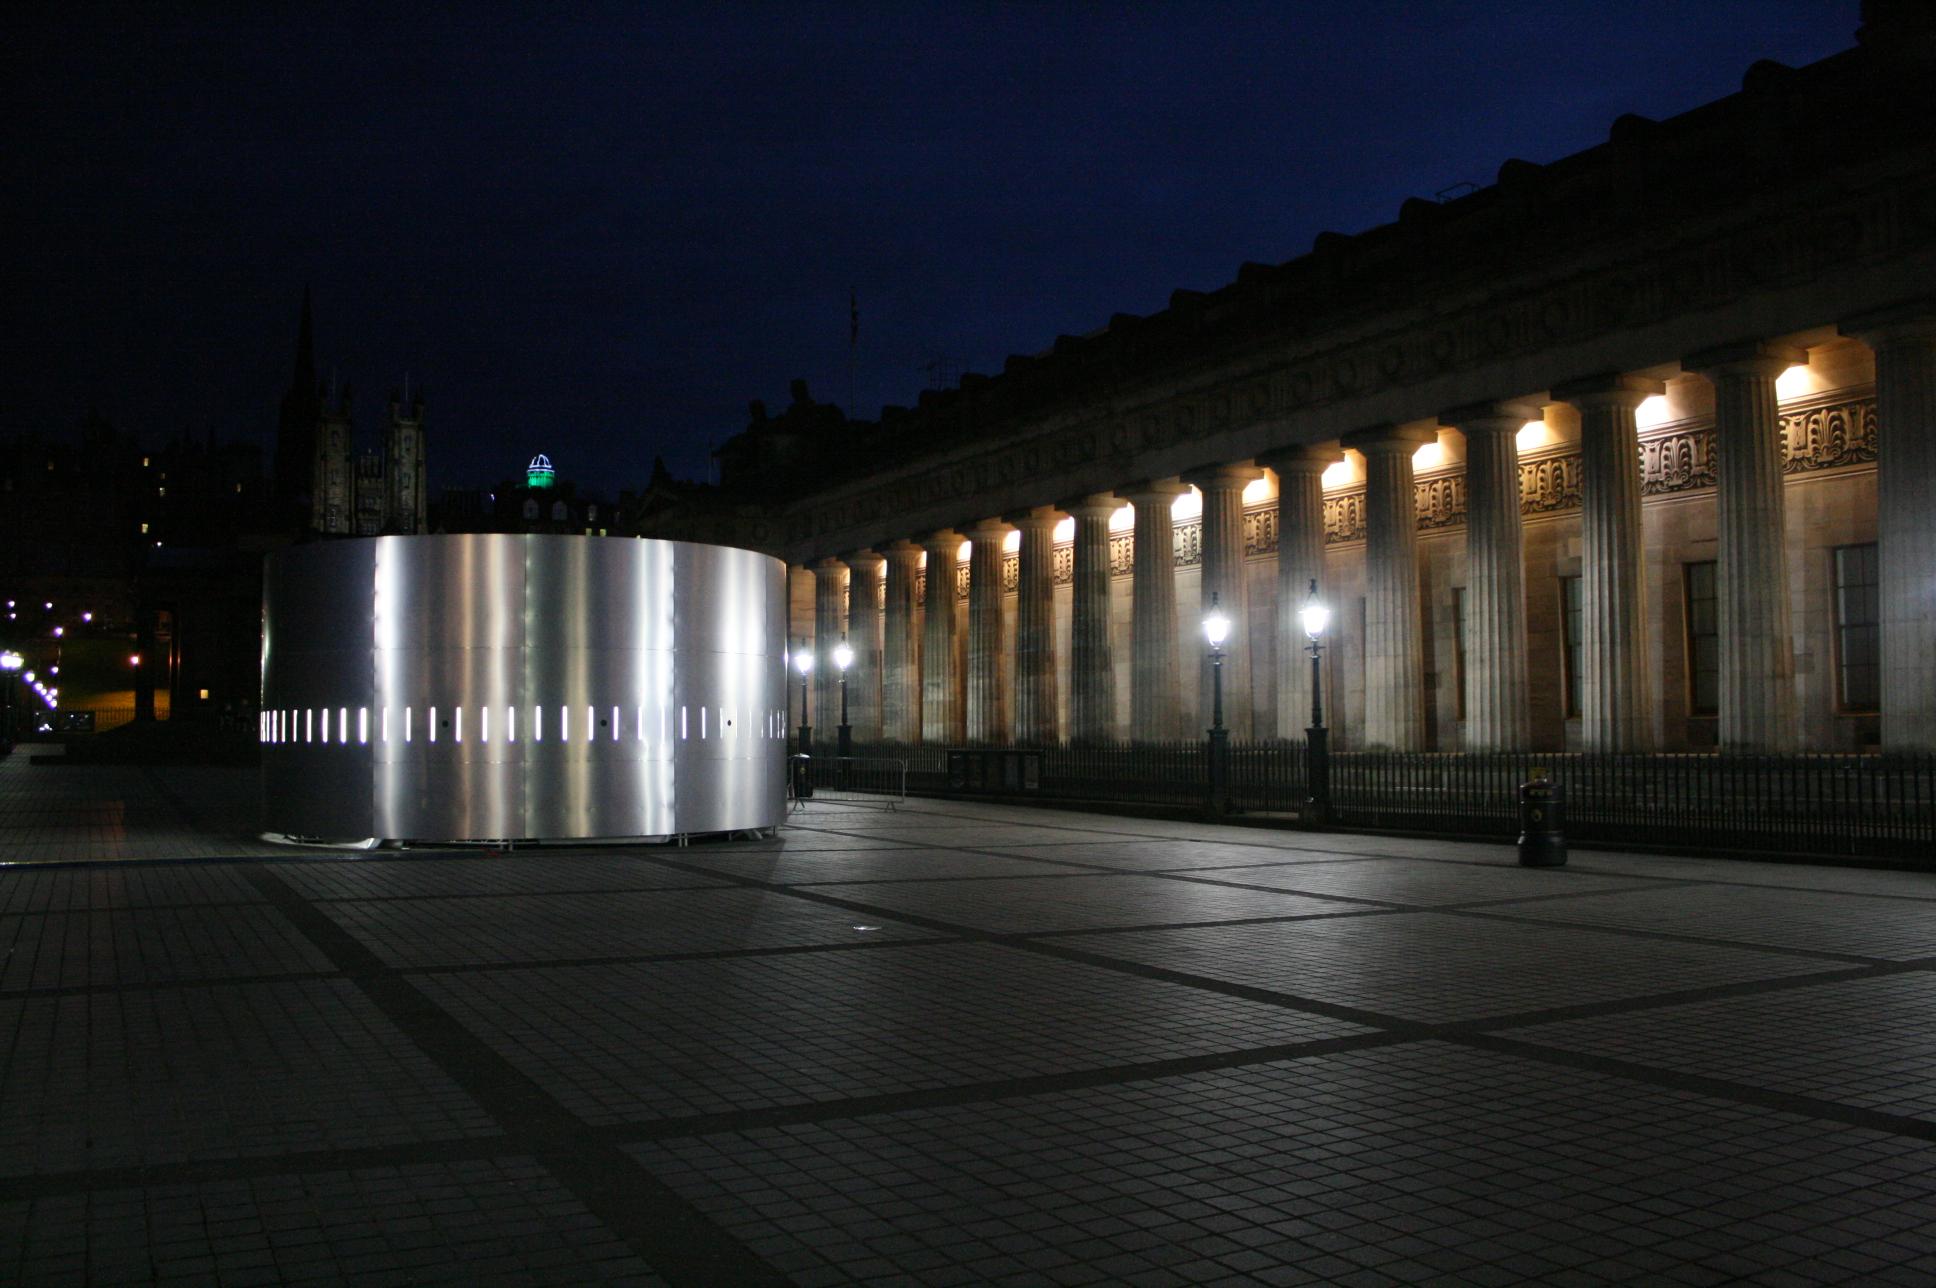 JBS_O2MemoryProject_ Edinburgh_night.JPG